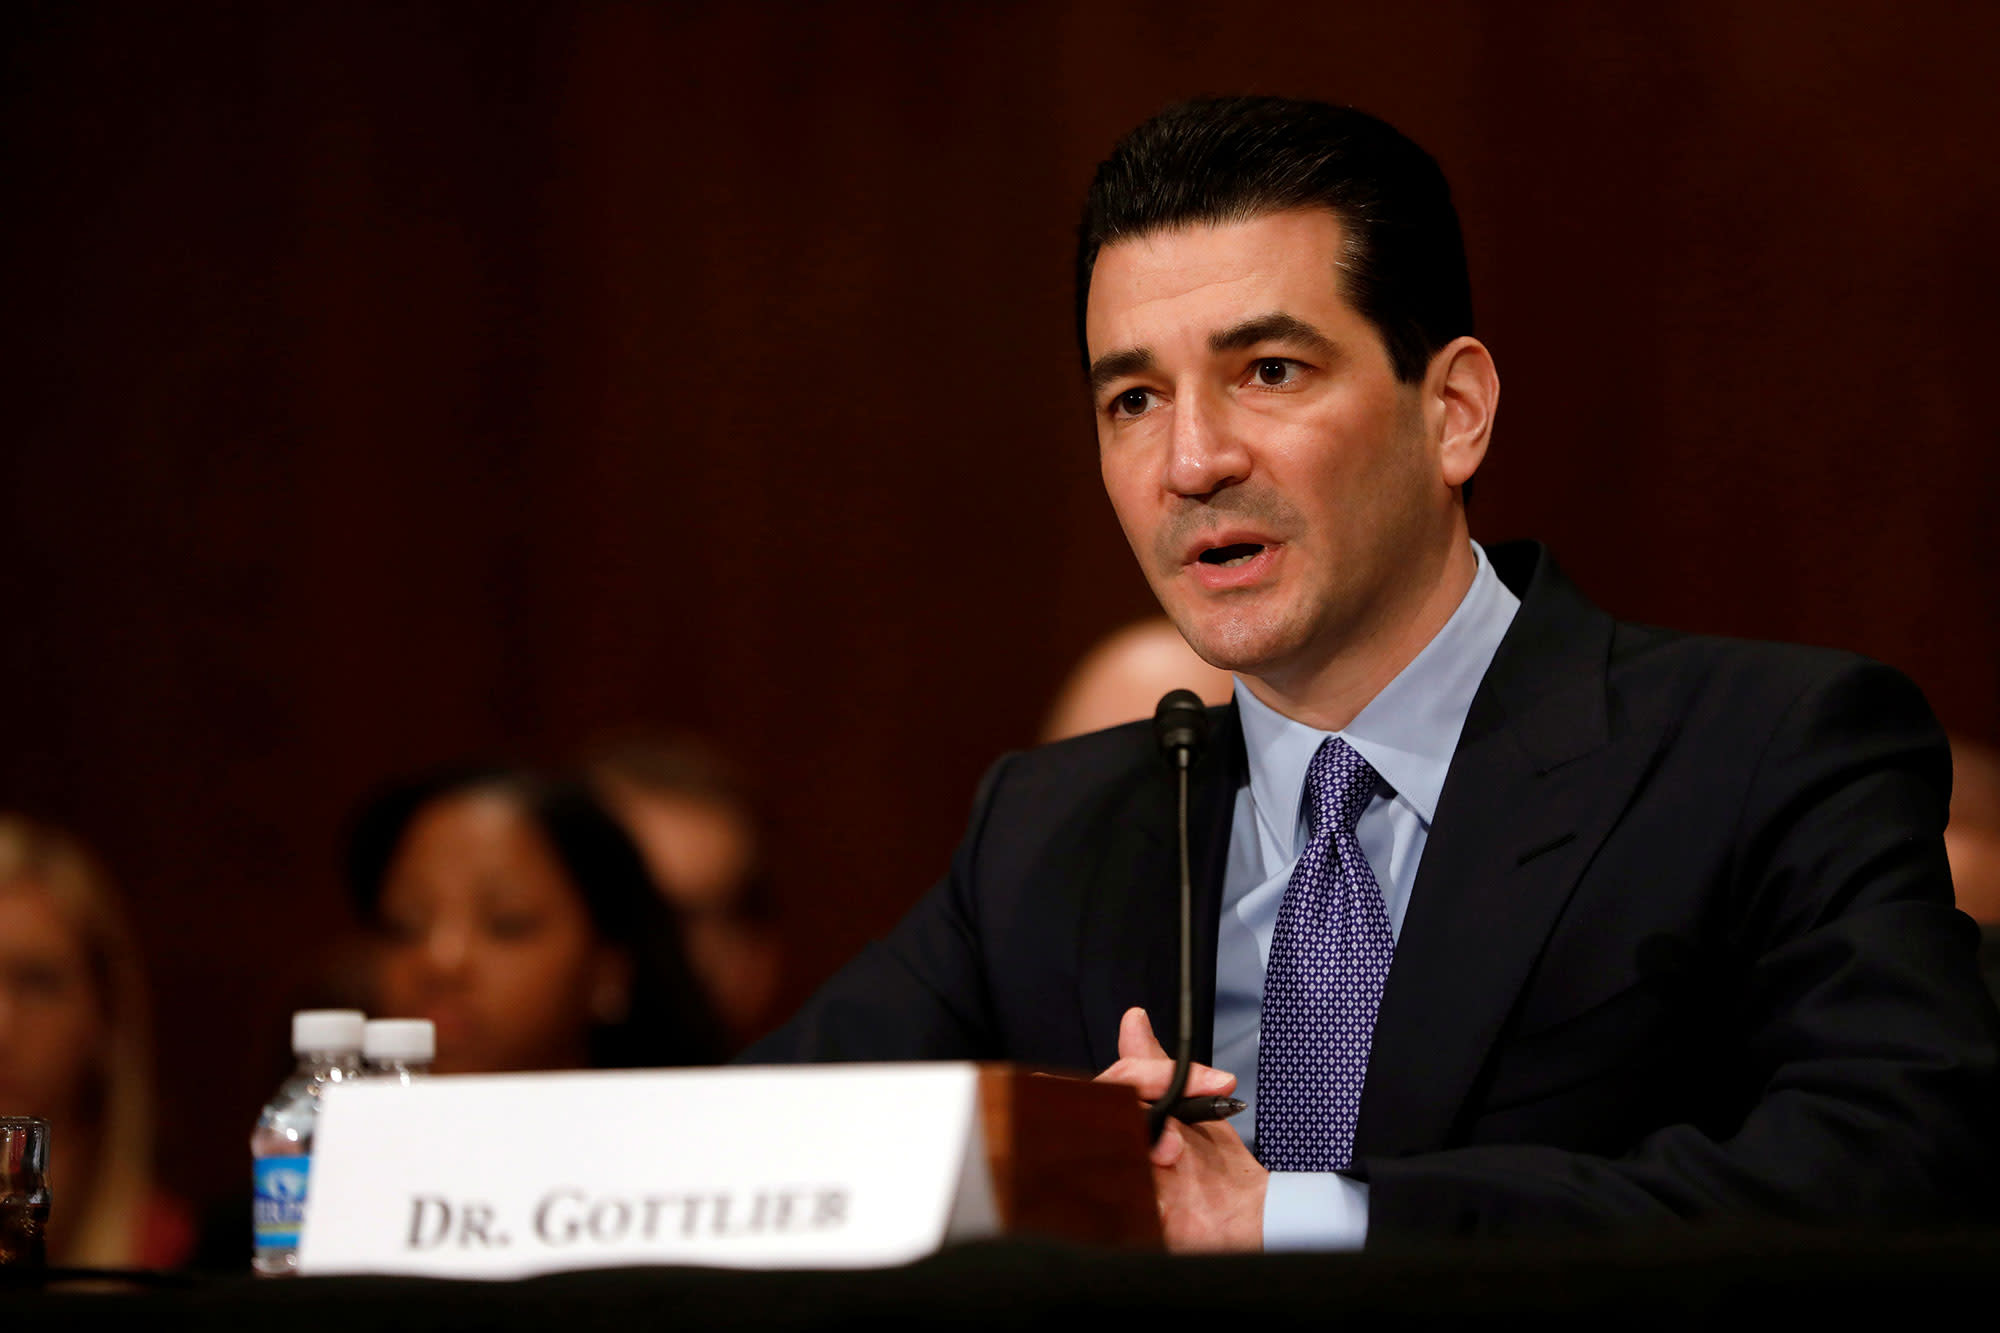 Dr. Scott Gottlieb says U.S. delta-driven Covid spike could peak in 3 weeks, following U.K. pattern